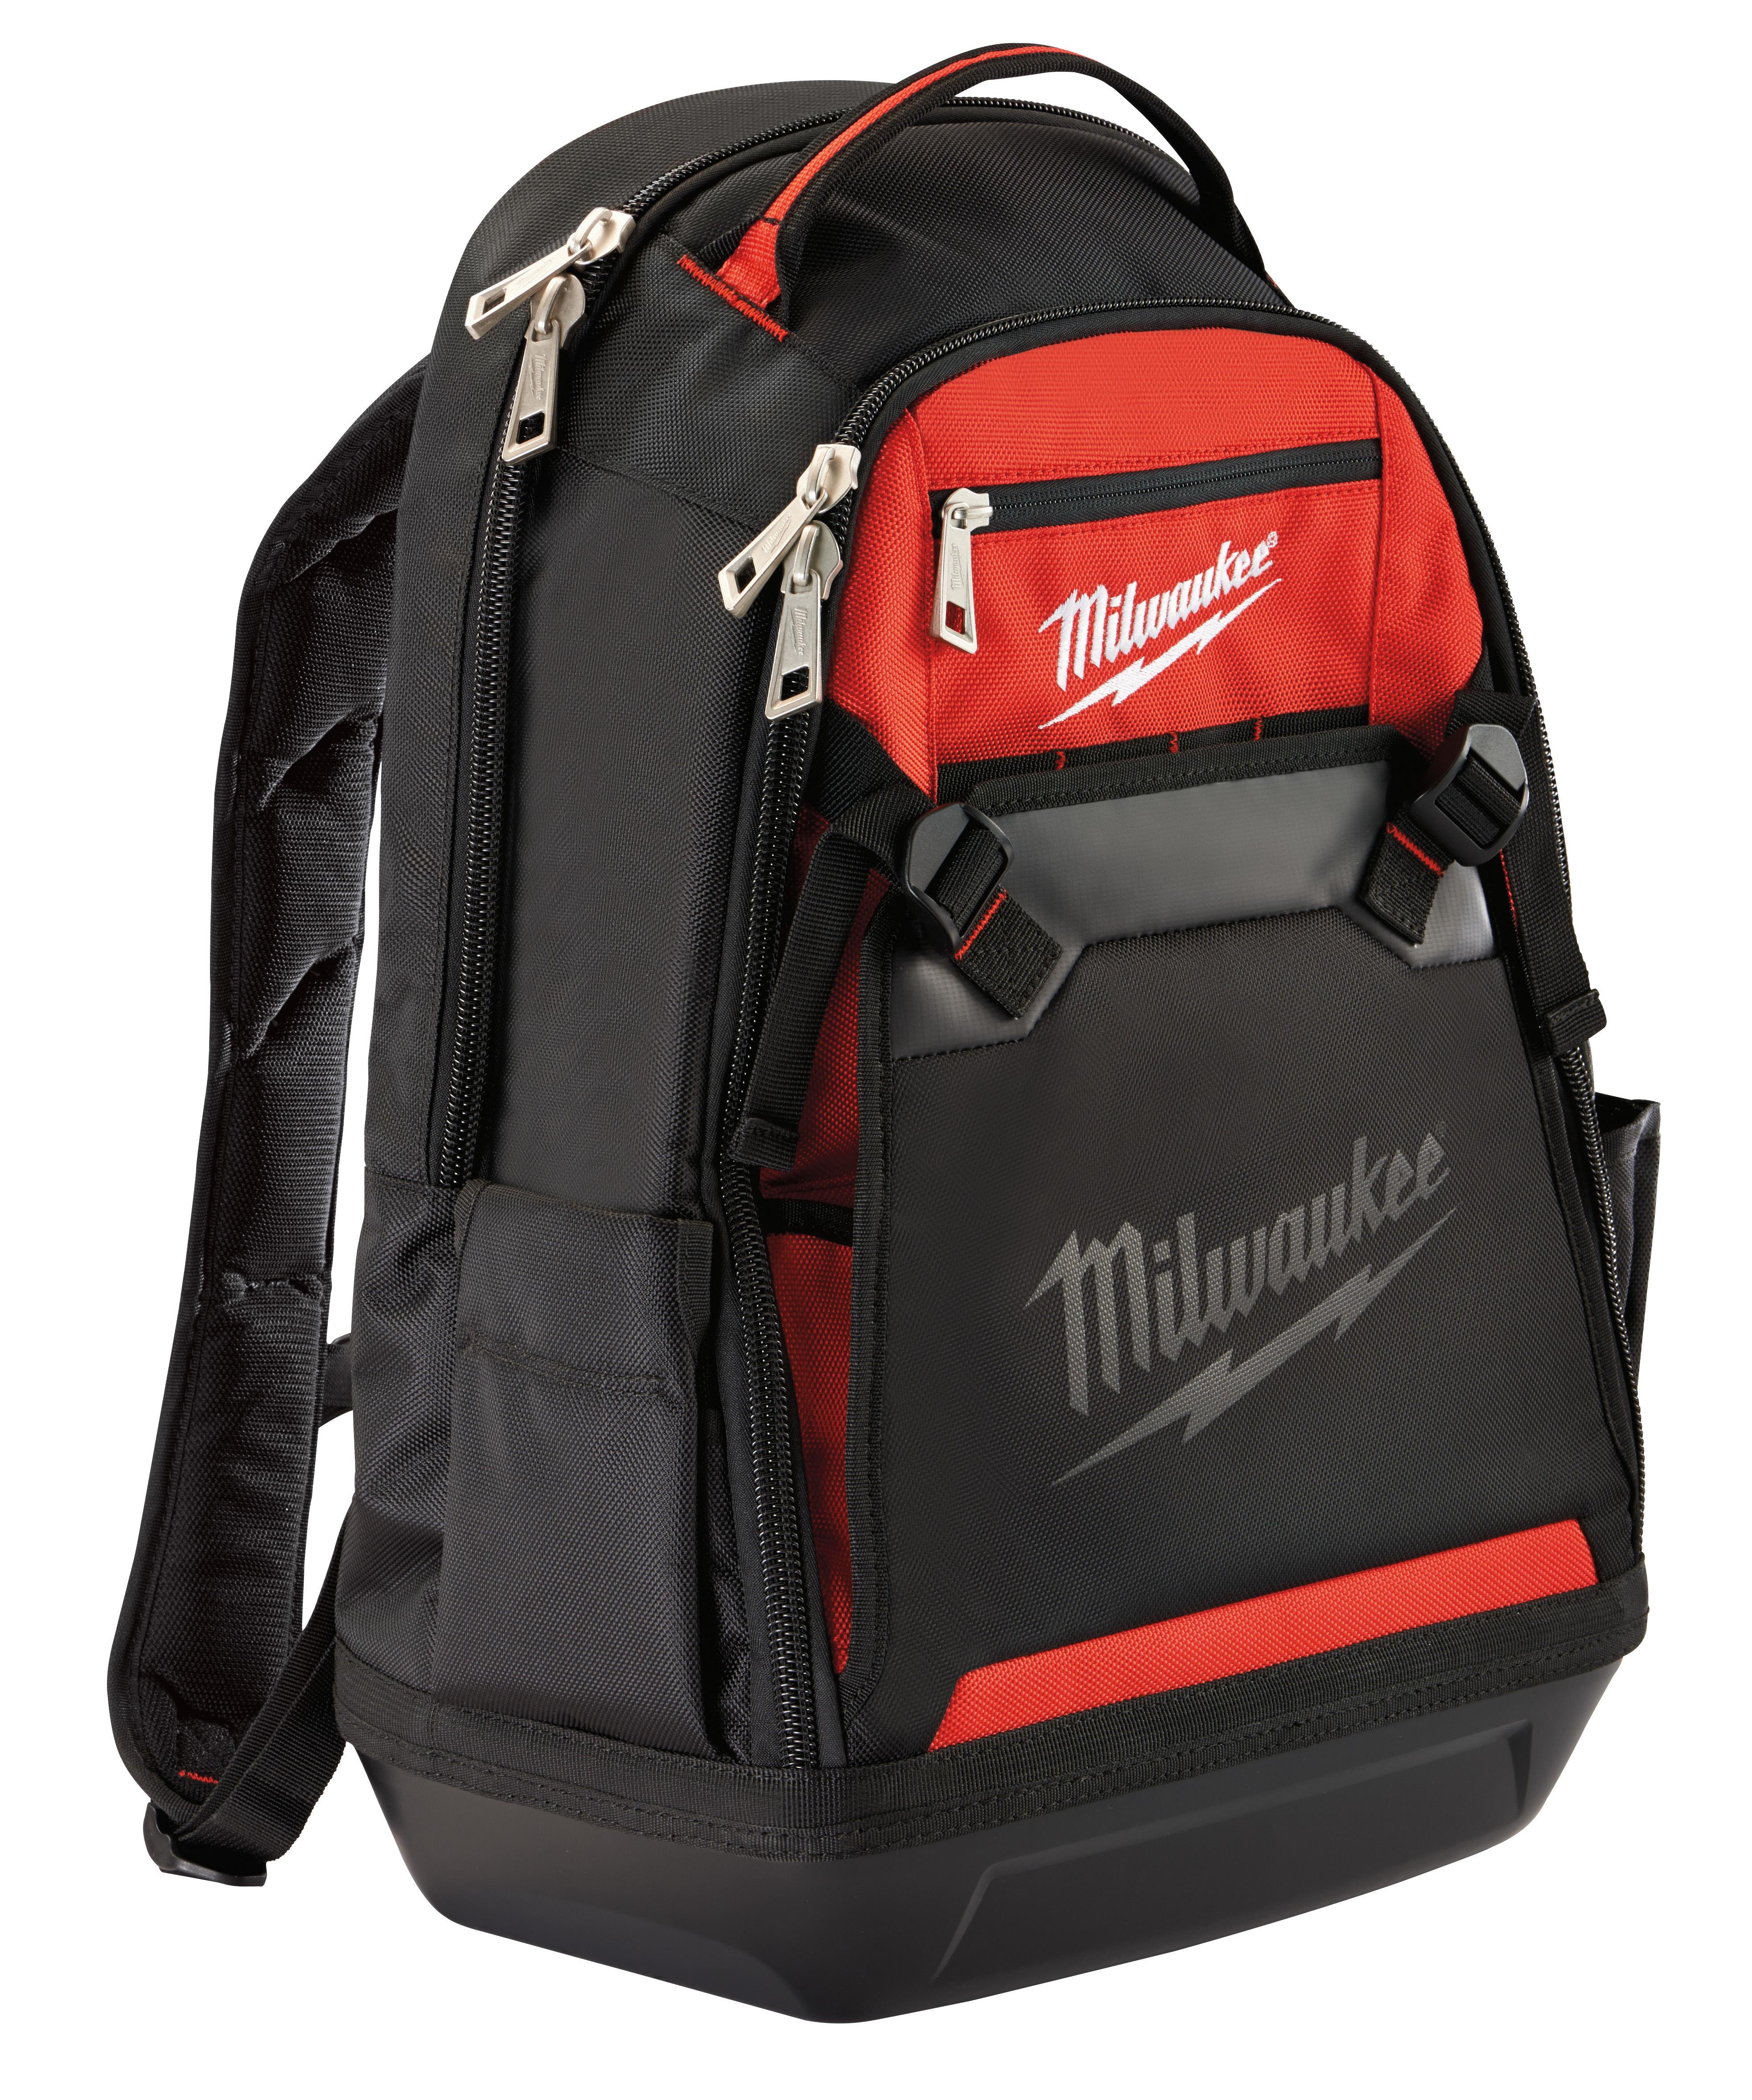 Milwaukee® 48-22-8200 Jobsite Backpack, Ballistic Polyester, Red